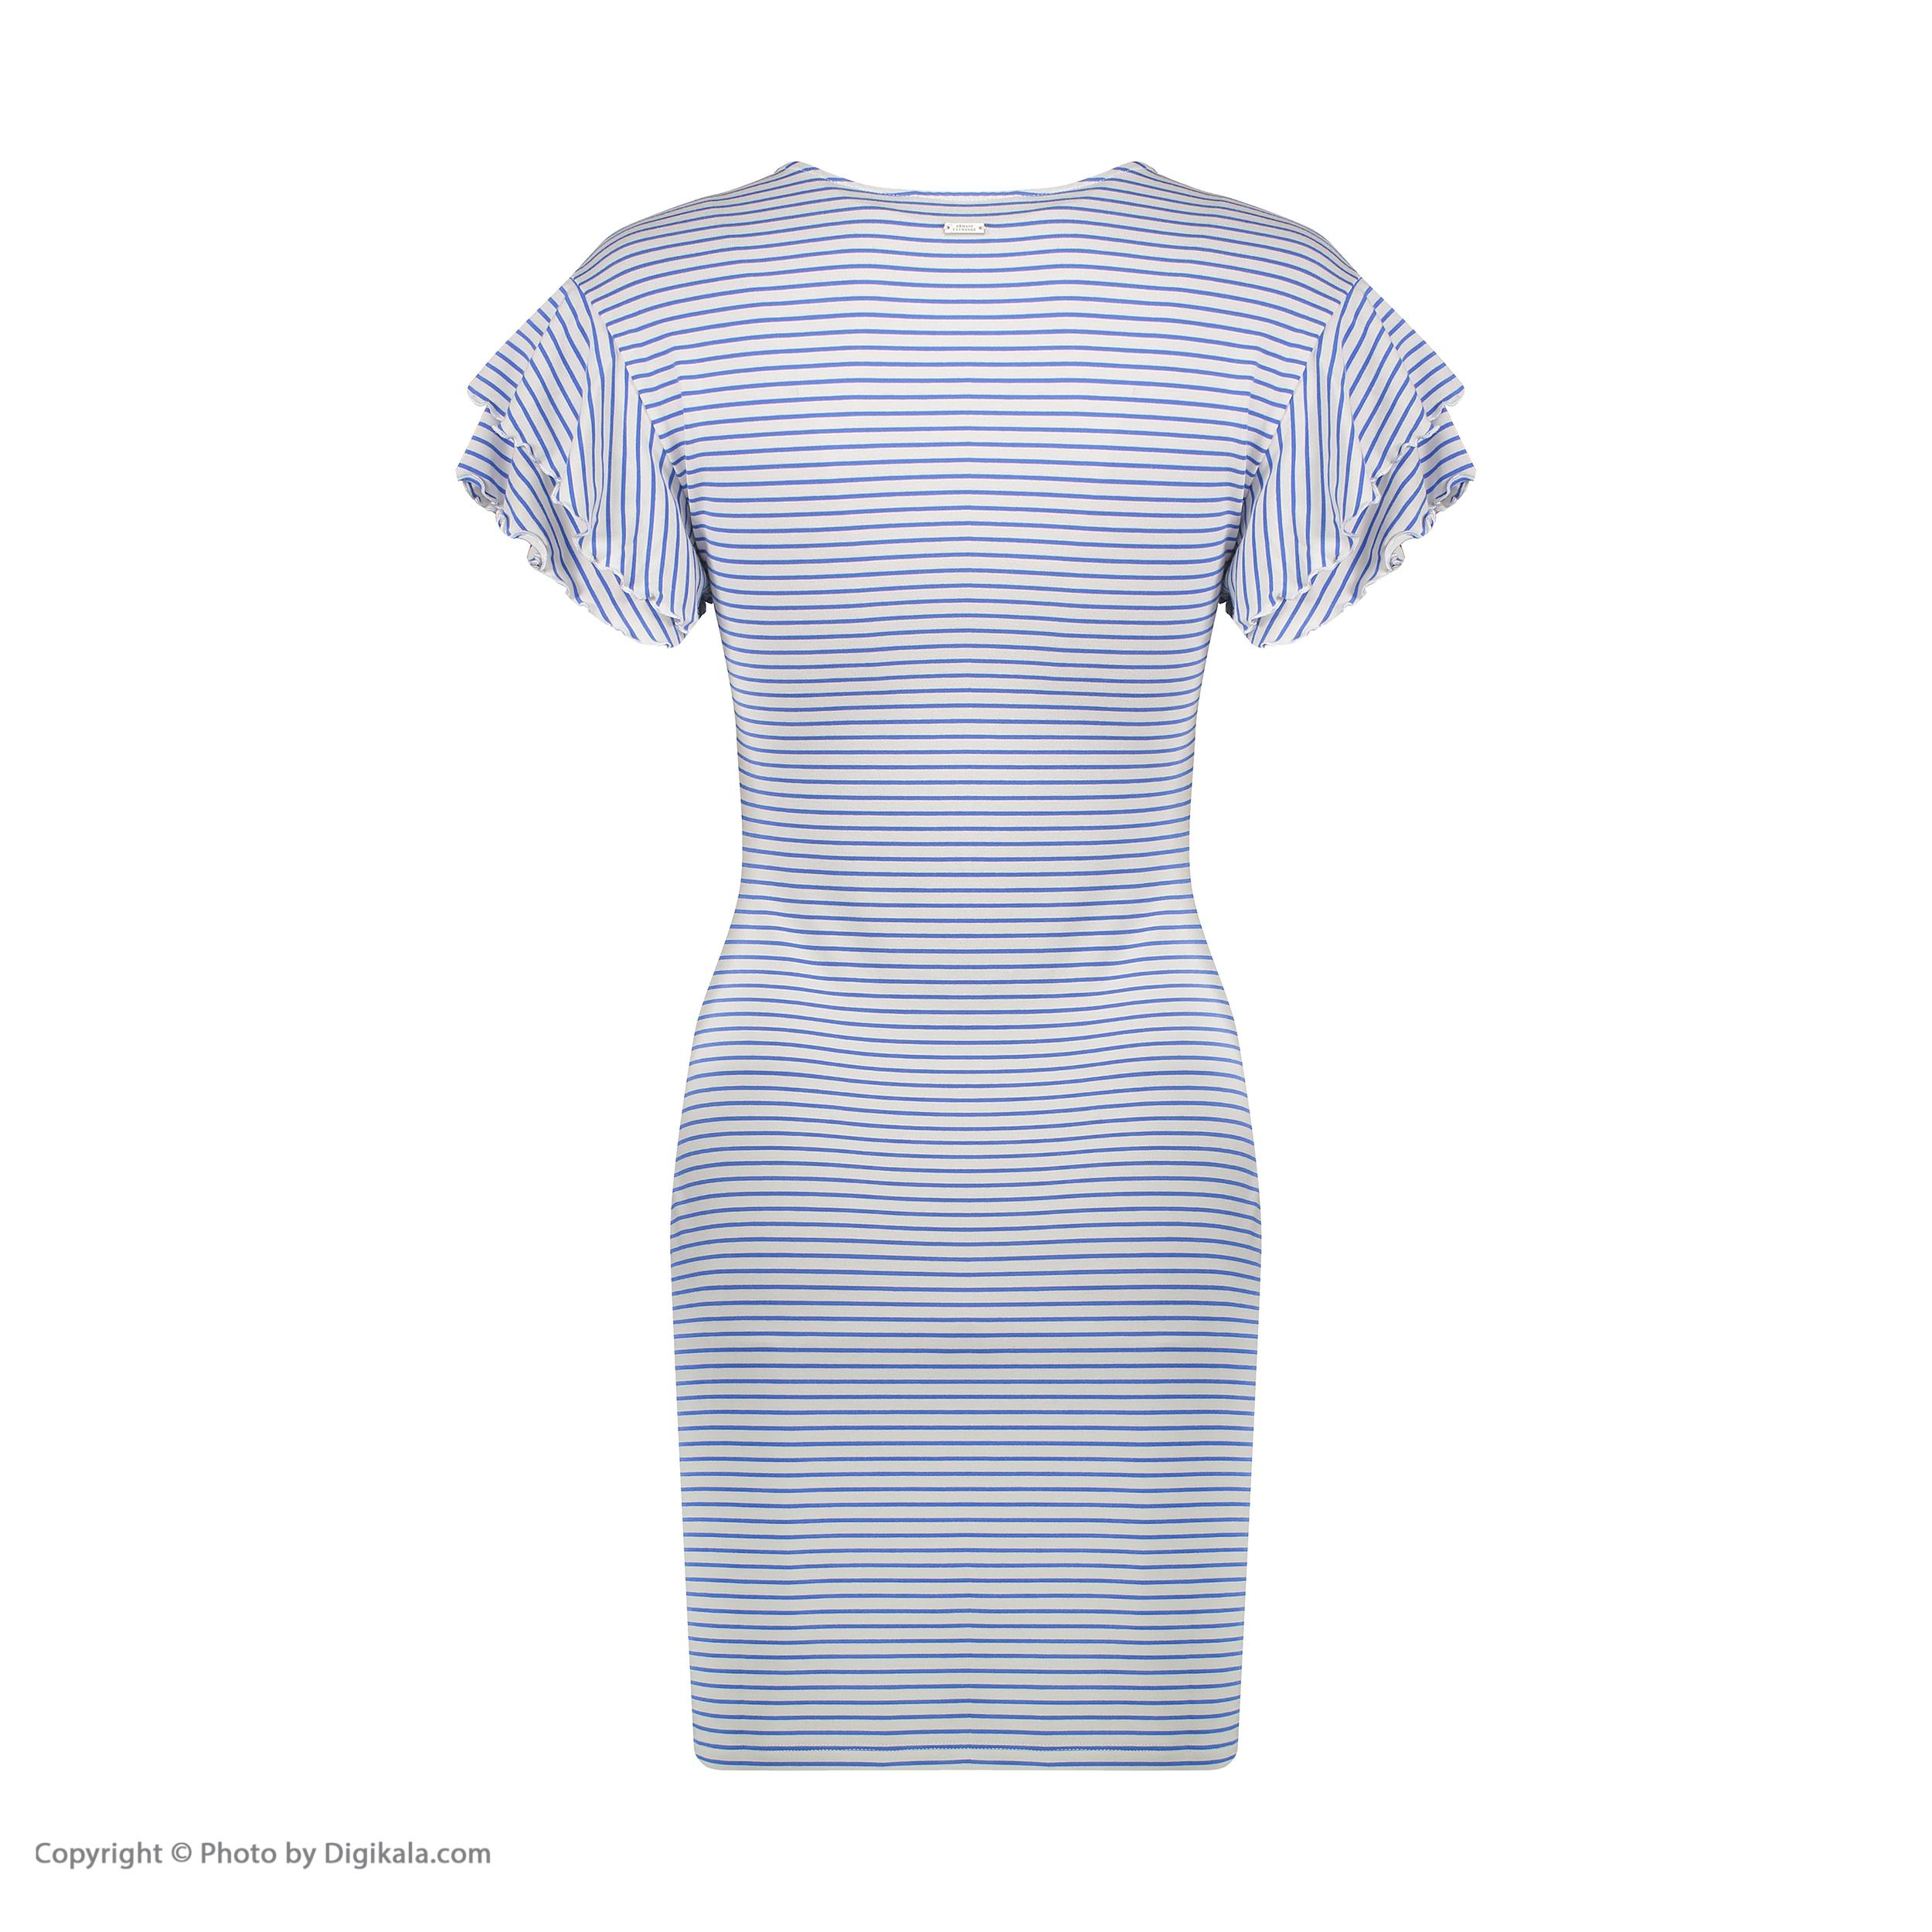 پیراهن زنانه آرمانی اکسچنج مدل 3ZYA88YJS6Z-0171